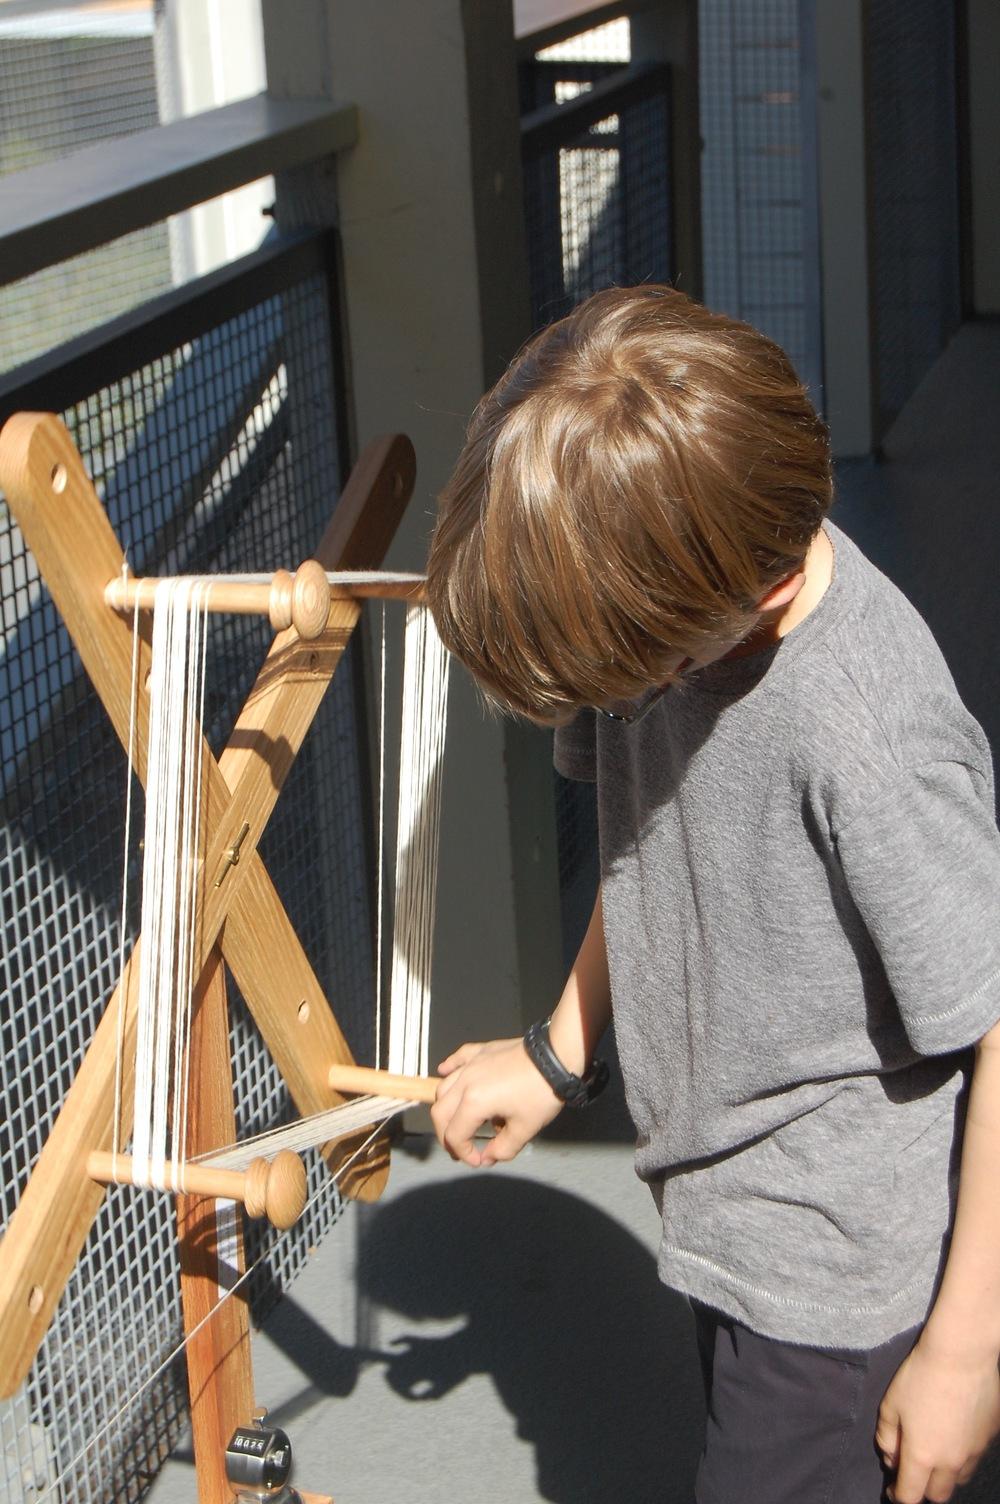 measuring the yarn